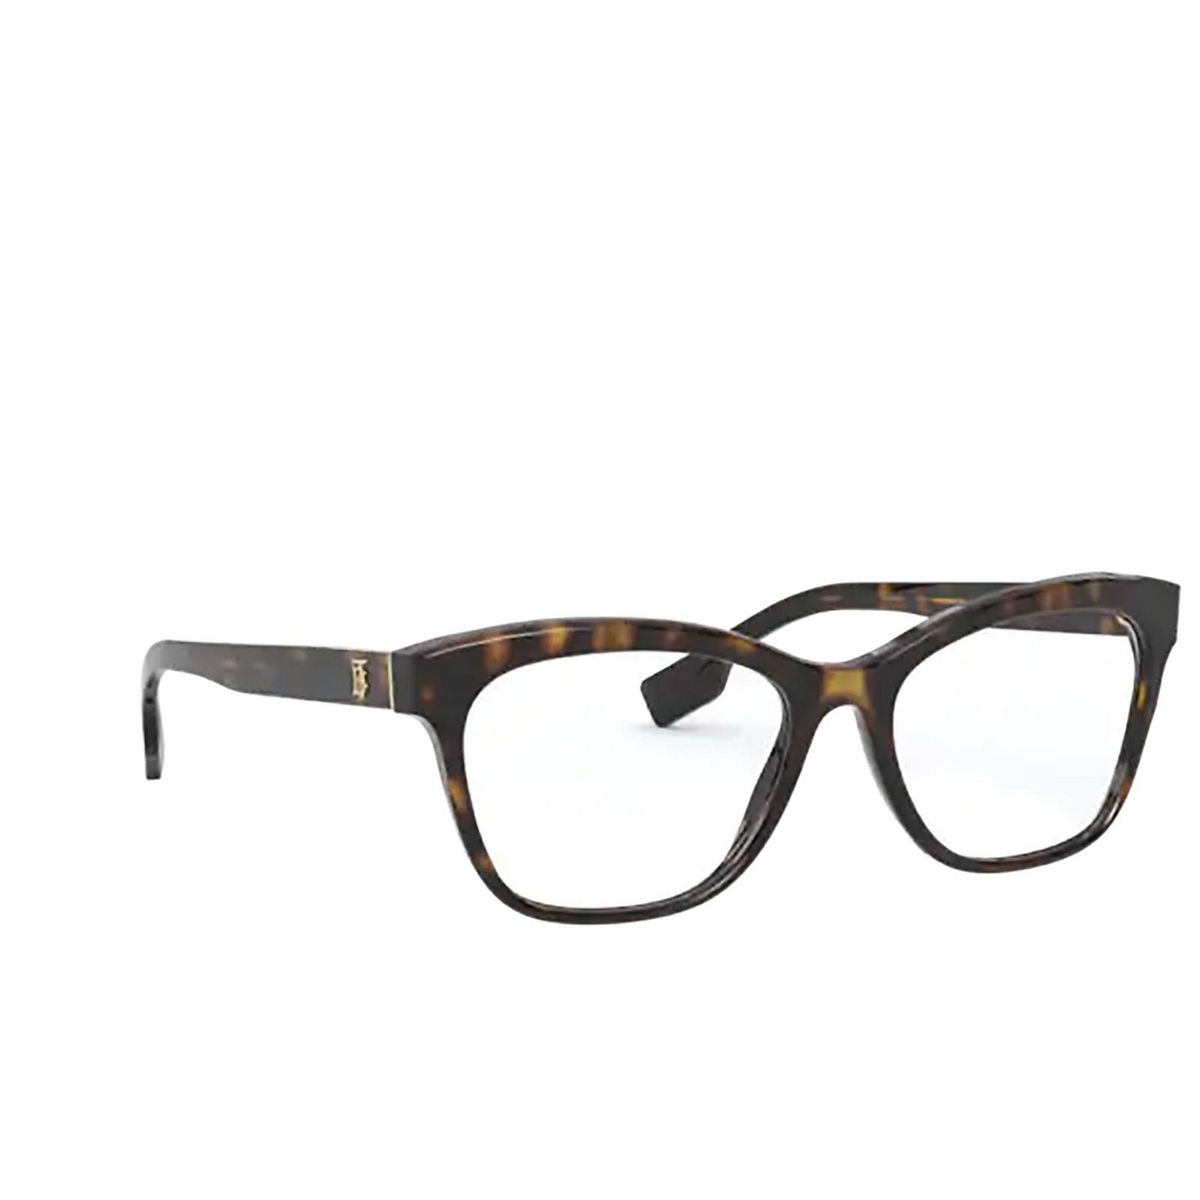 Burberry® Square Eyeglasses: Mildred BE2323 color Dark Havana 3002 - three-quarters view.